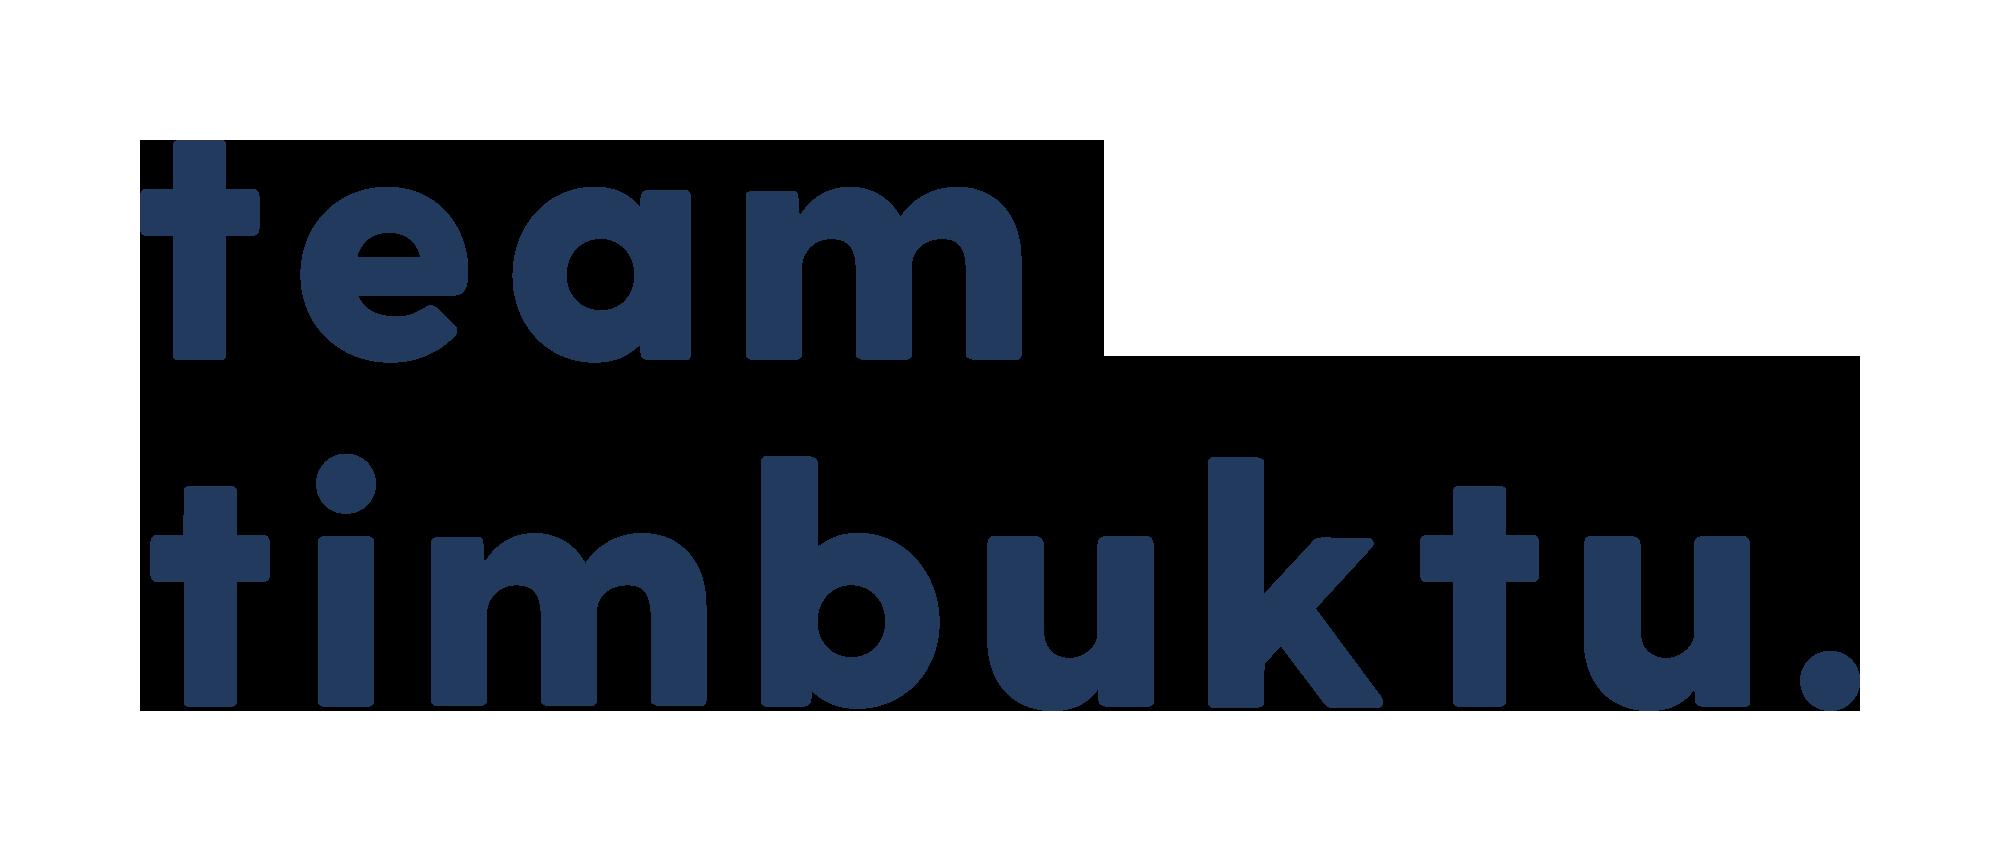 Team Timbuktu